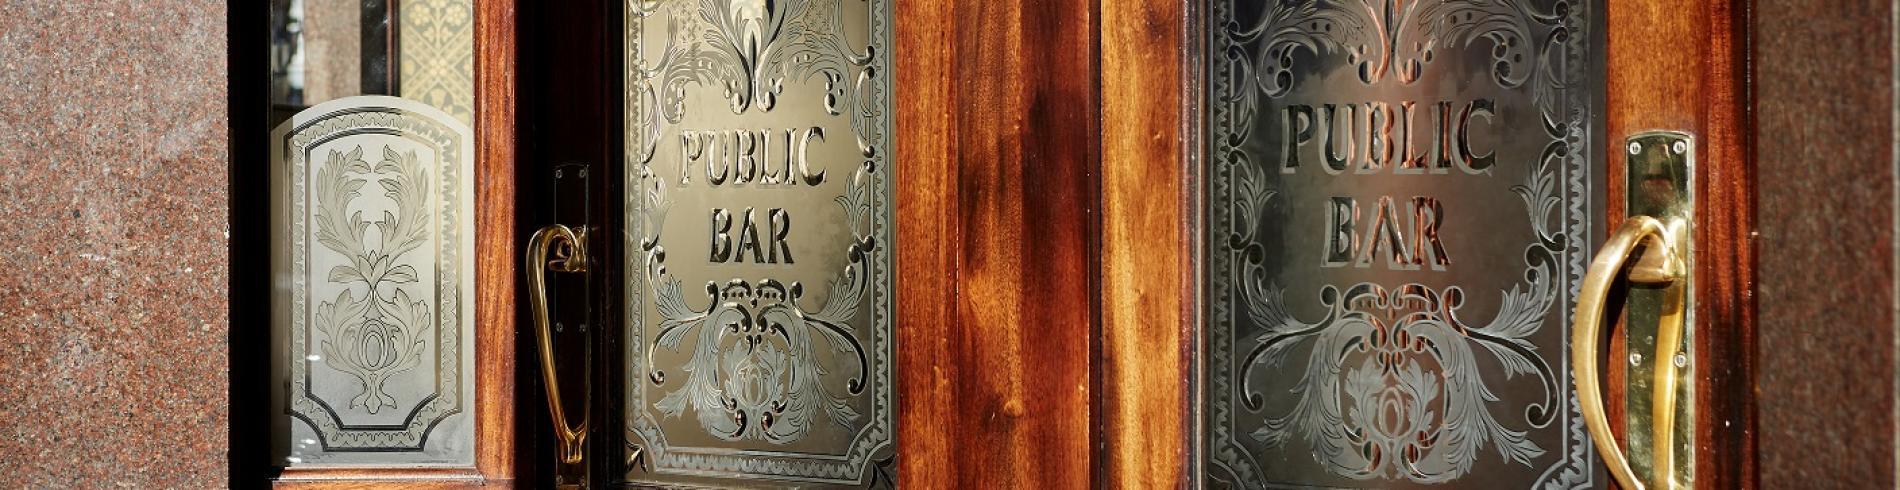 A pub entrance in London